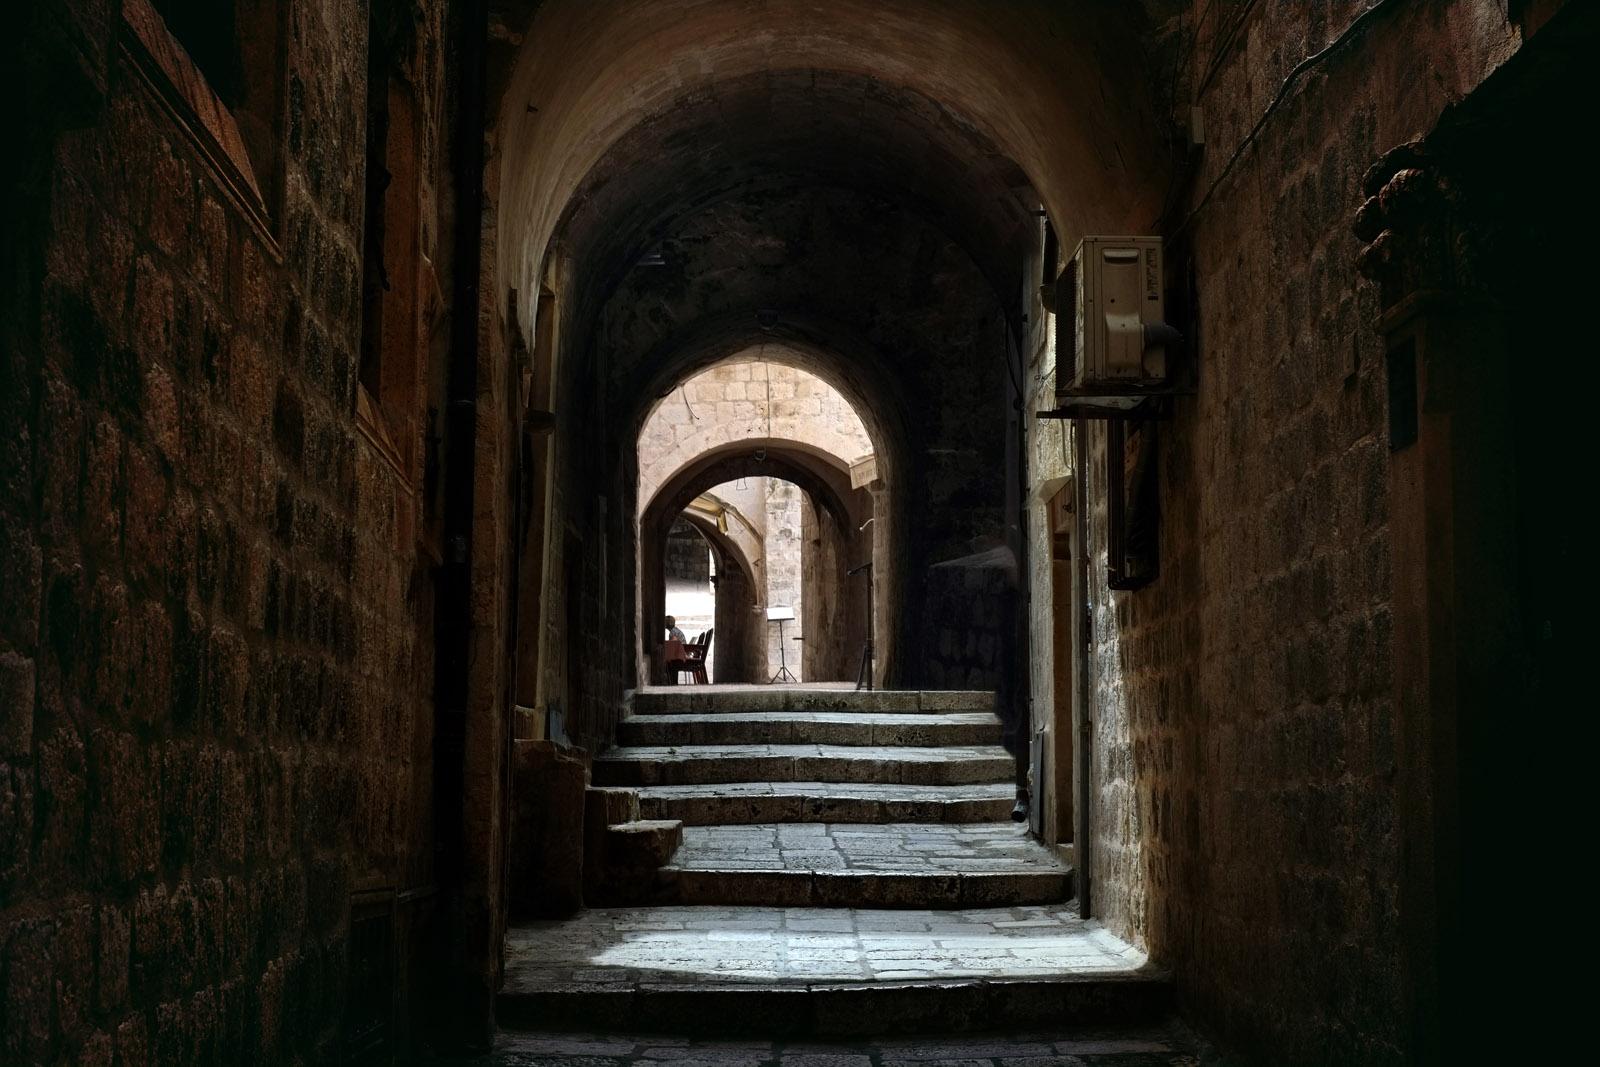 Dubrovnik.jpg?fit=1600%2C1067